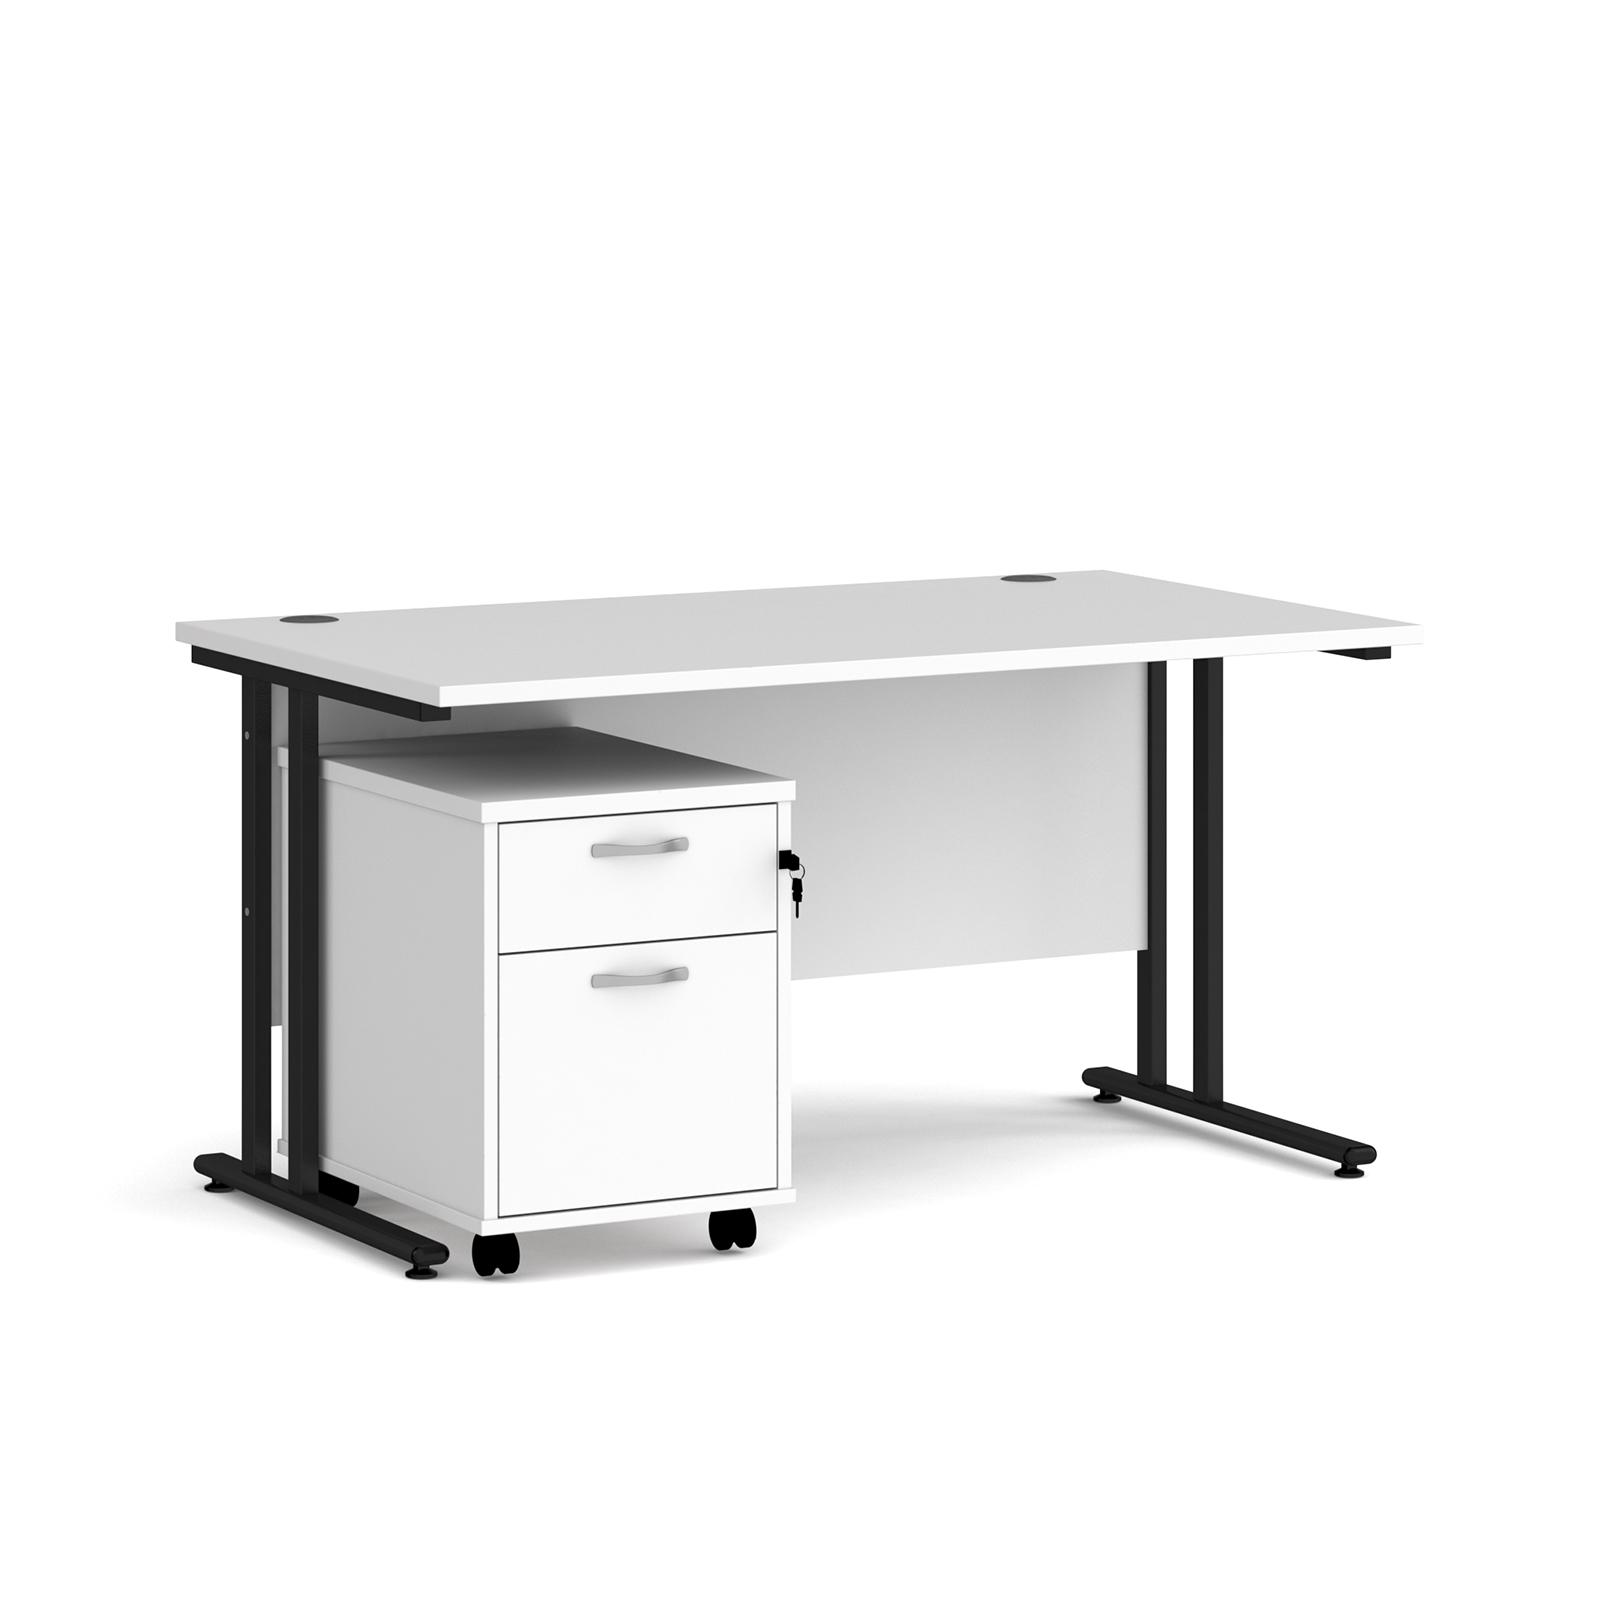 Rectangular Desks Maestro 25 straight desk 1400mm x 800mm with black cantilever frame and 2 drawer pedestal - white